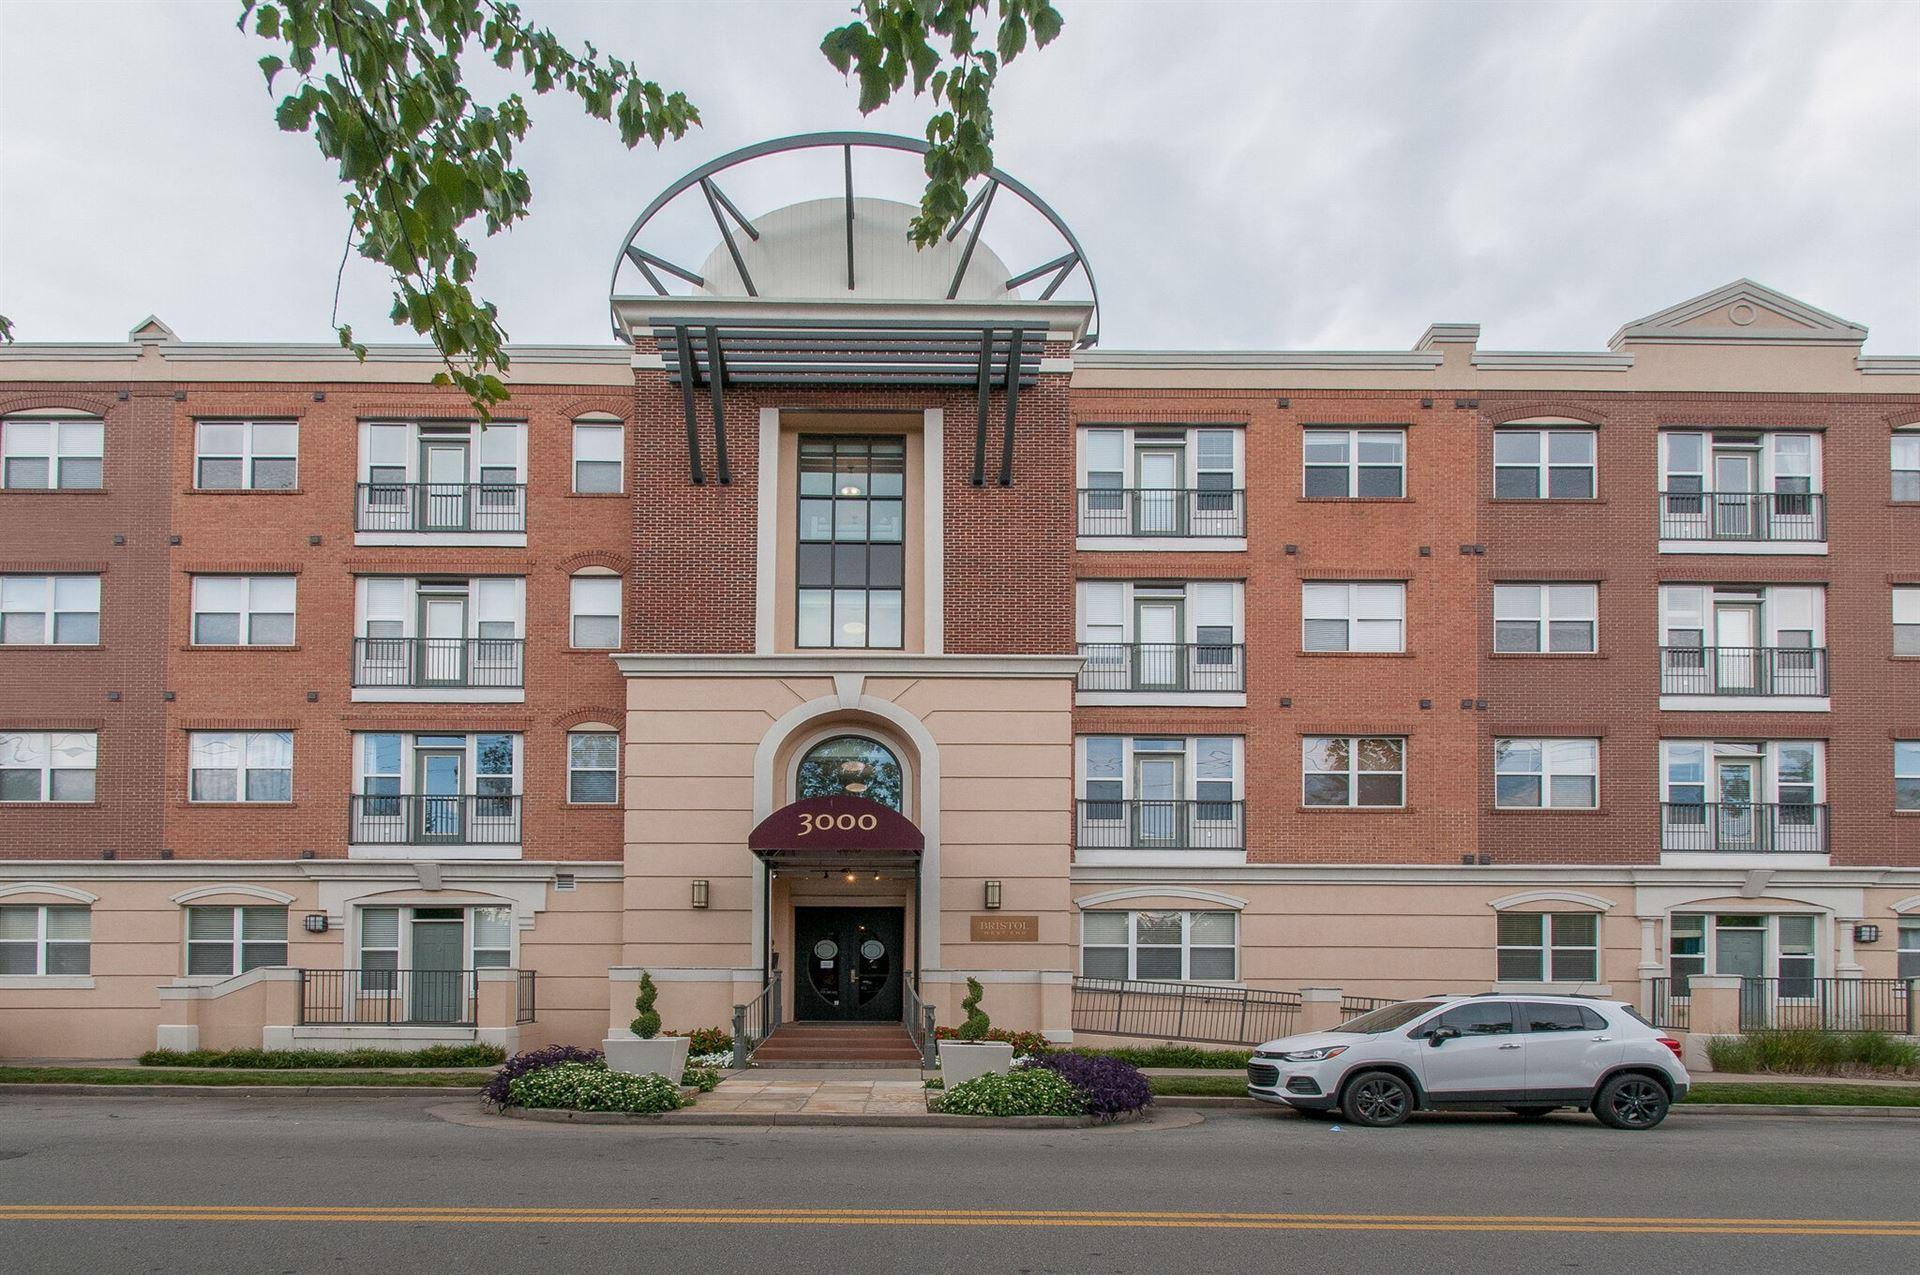 Photo of 3000 Vanderbilt Place, Apt 425 #425, Nashville, TN 37212 (MLS # 2168227)